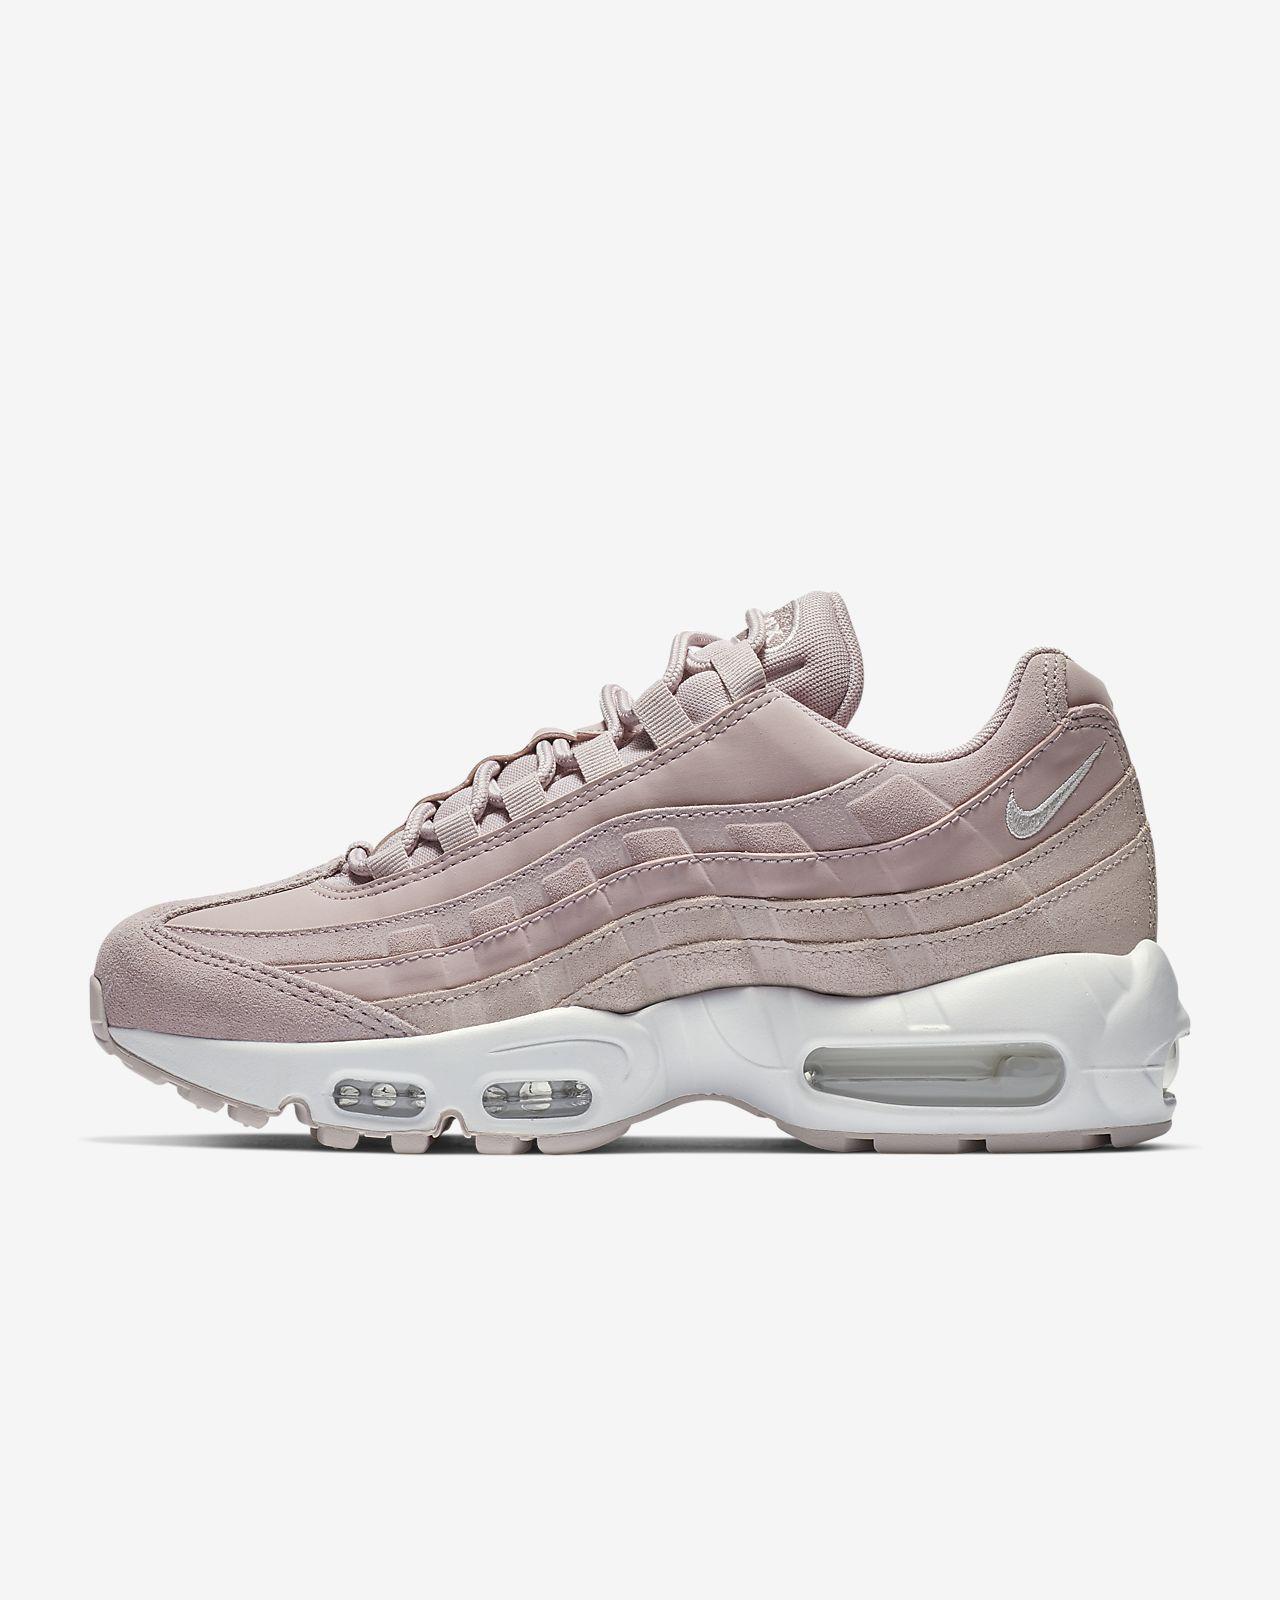 online retailer 3350c 8343b ... Chaussure Nike Air Max 95 Premium pour Femme